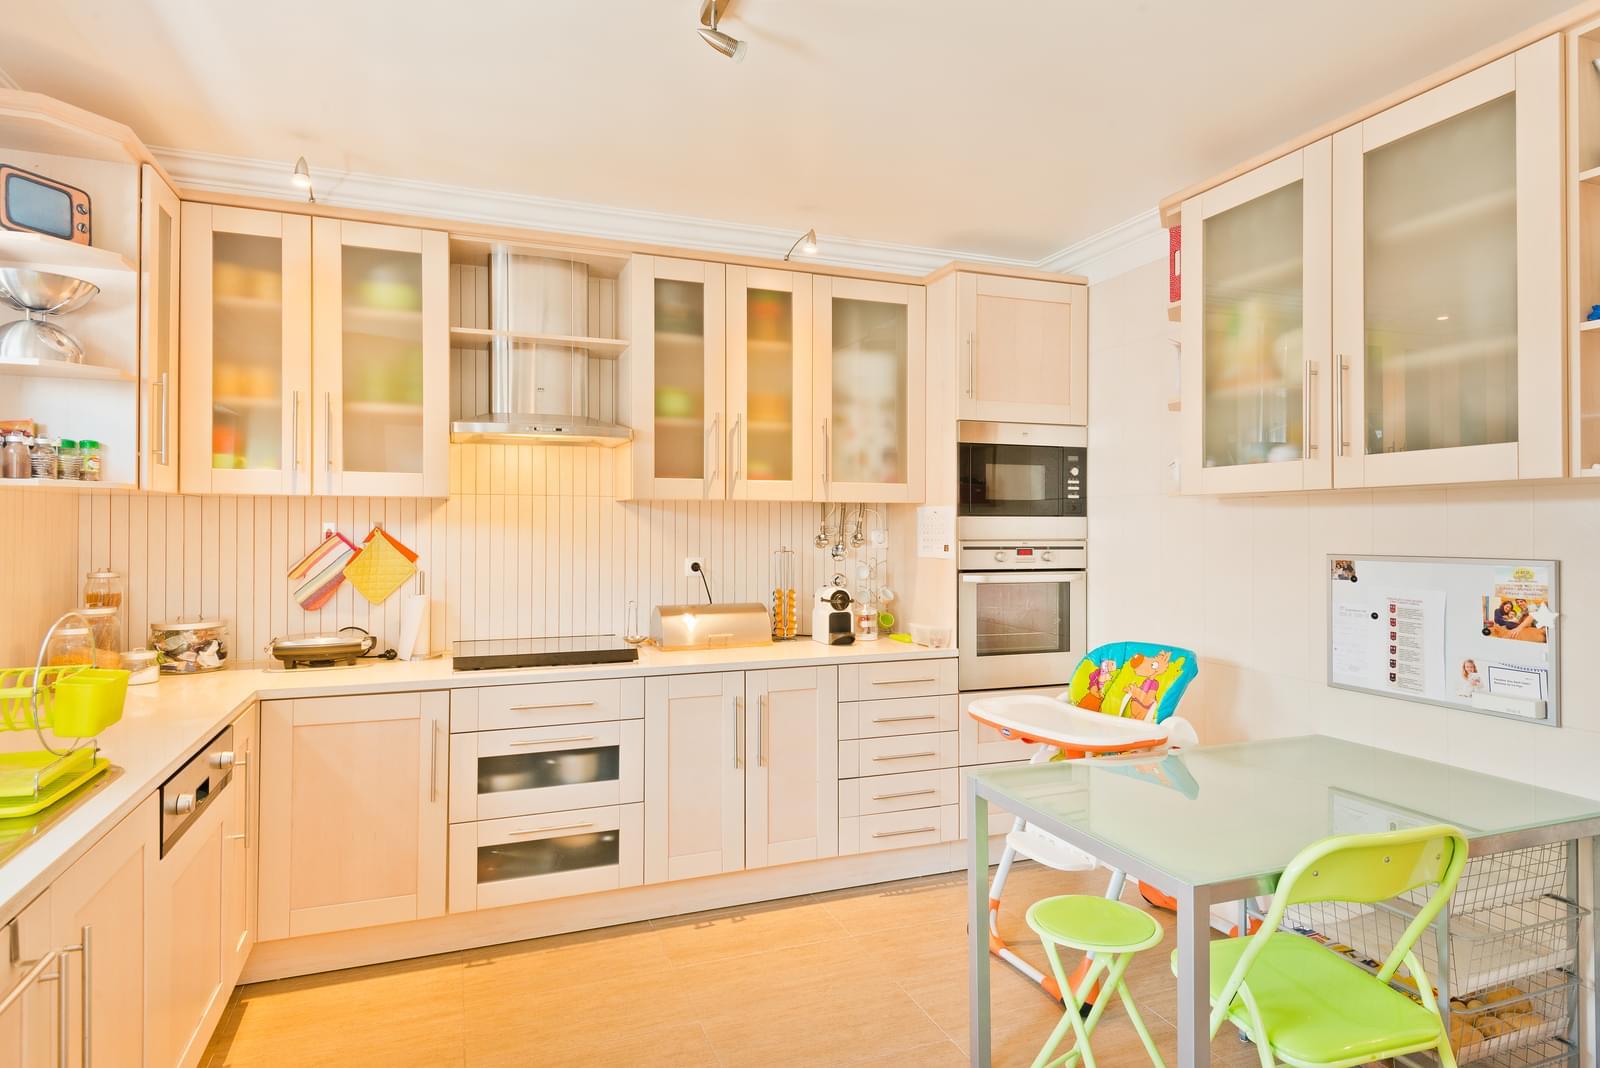 pf17498-apartamento-t2-cascais-f2d3aae1-f80f-411c-81e9-901565d66384